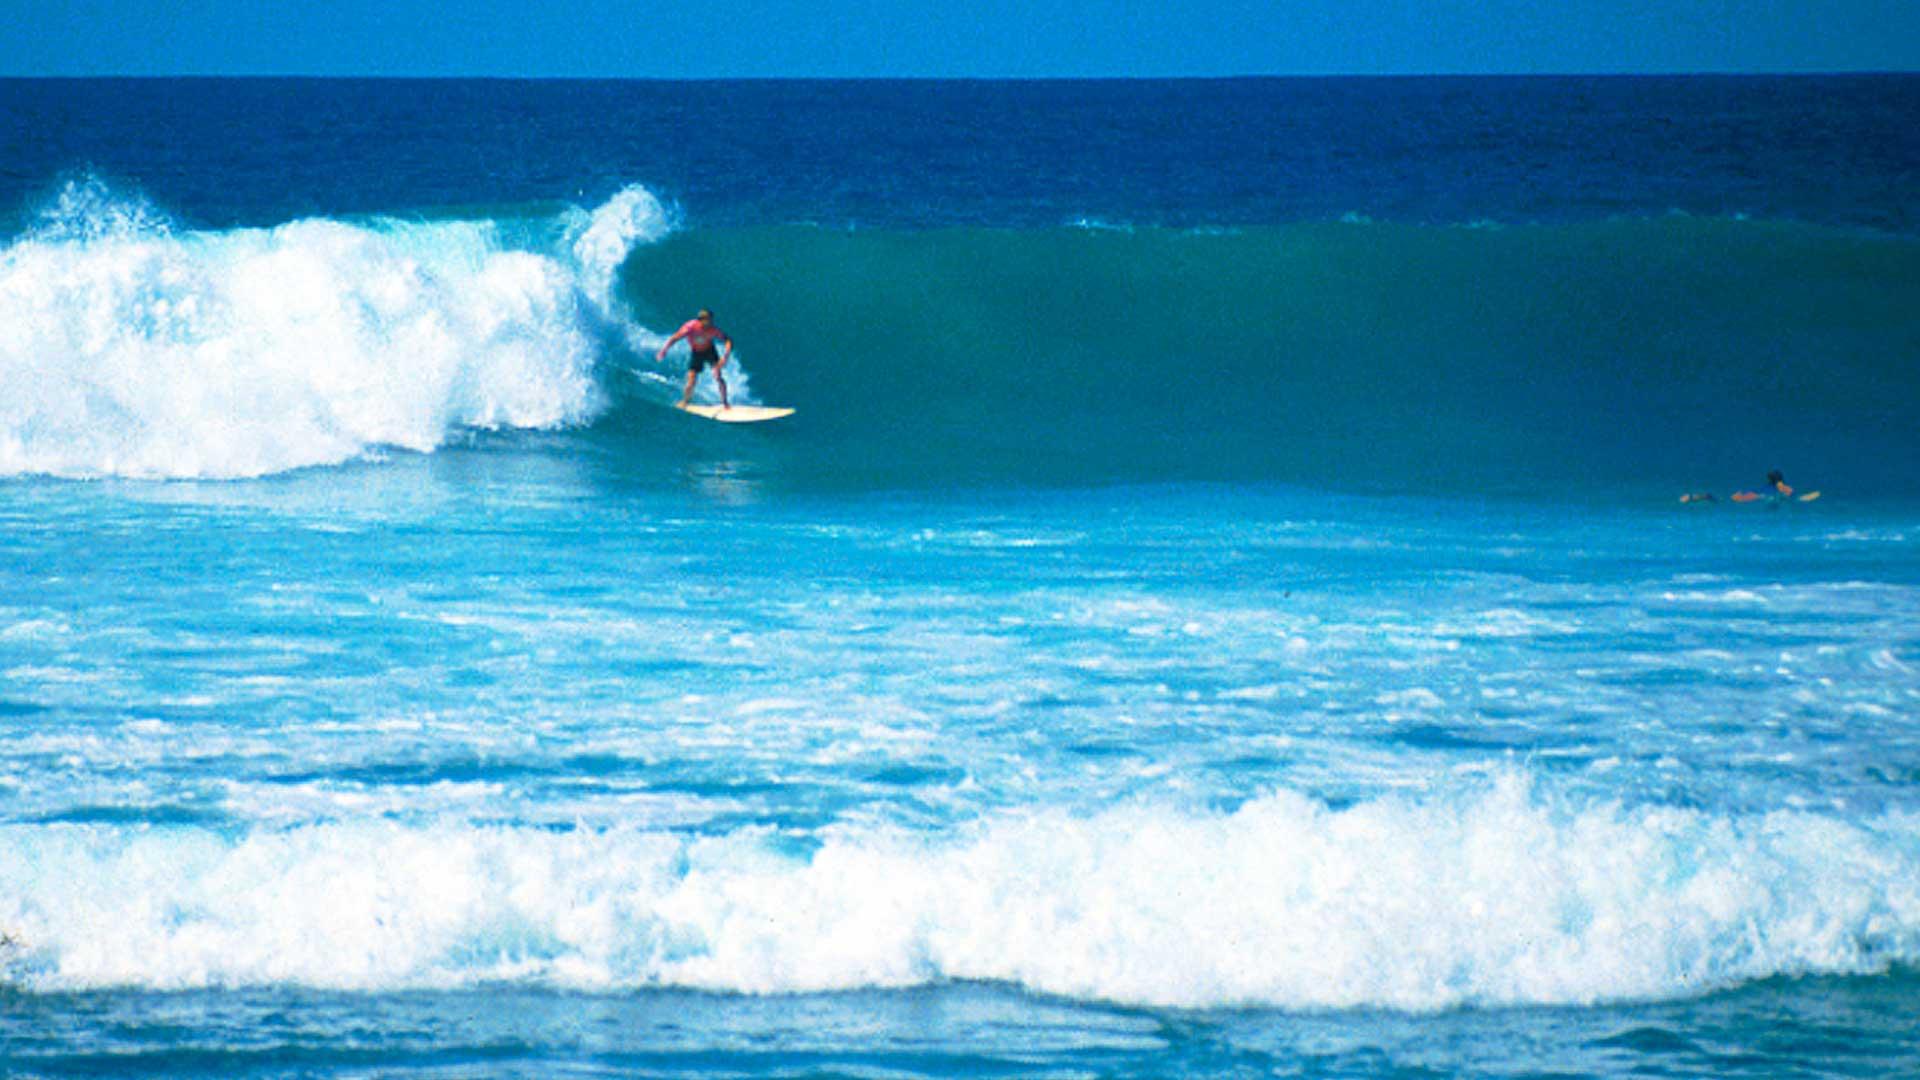 Steven Andrew Martin 1992 | South swells at Lyman's Point, Kailua-Kona, Big Island